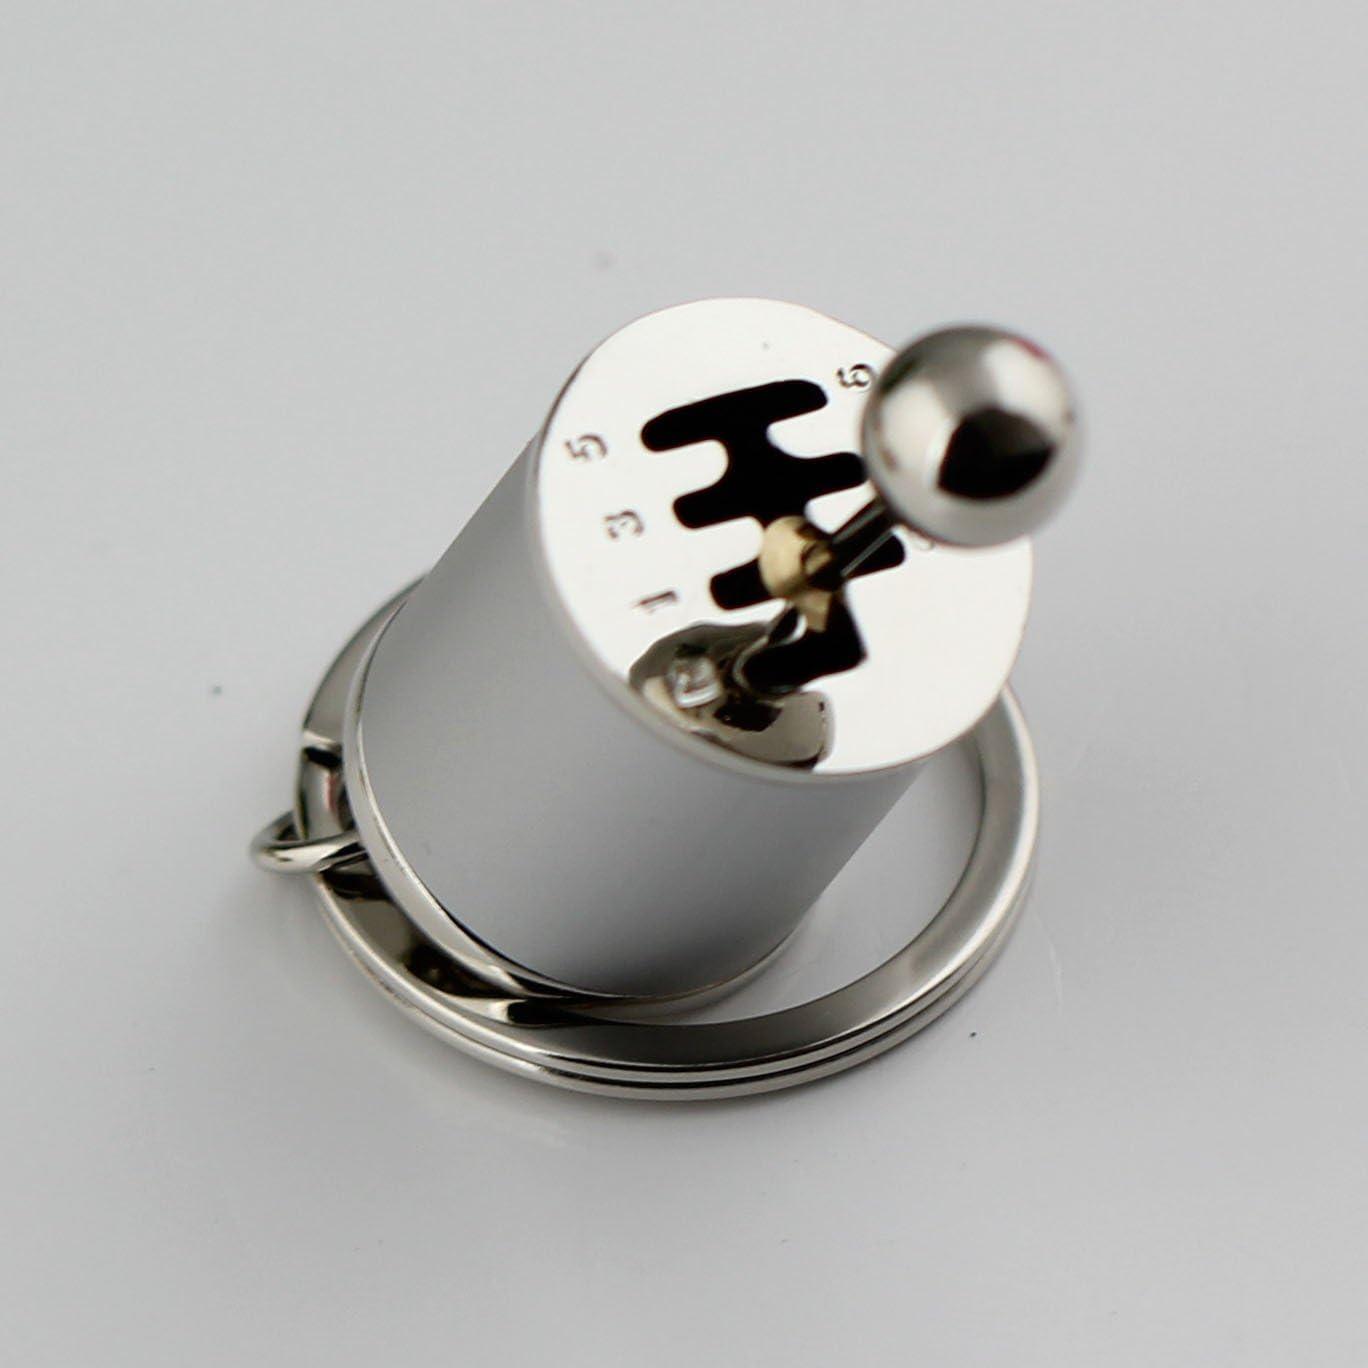 Silver maycom Creative Auto Part Model Gear Box Keychain Six-Speed Manual Transmission Shift Lever Keyring Key Chain Ring Keyrings Keyfob